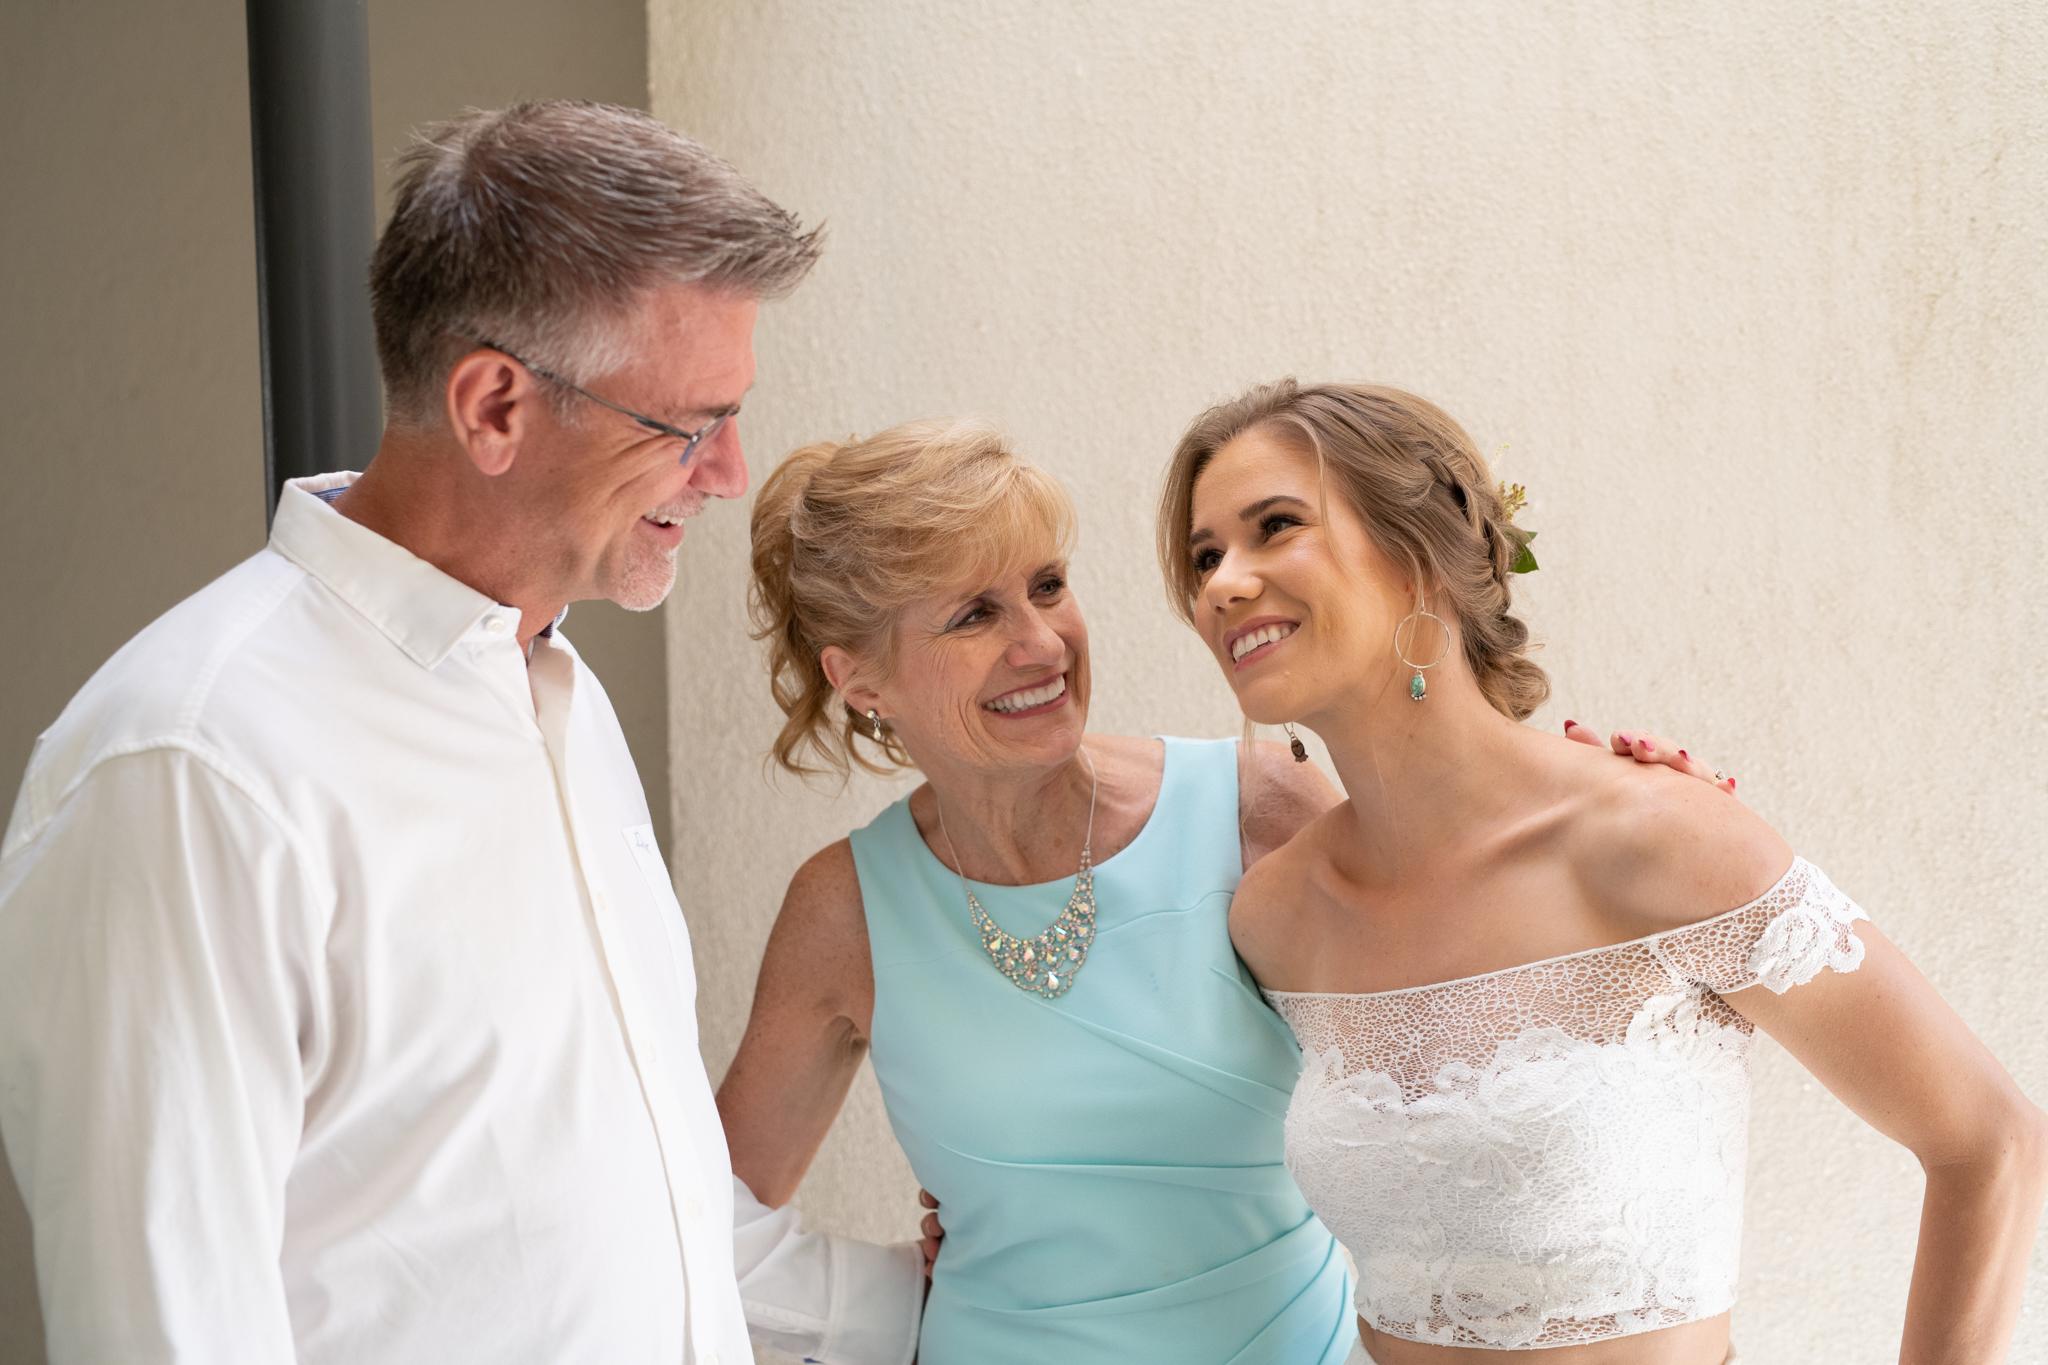 05_PRVW_Jenny_Ken_Wedding_Trevor_Hooper_Photo.jpg